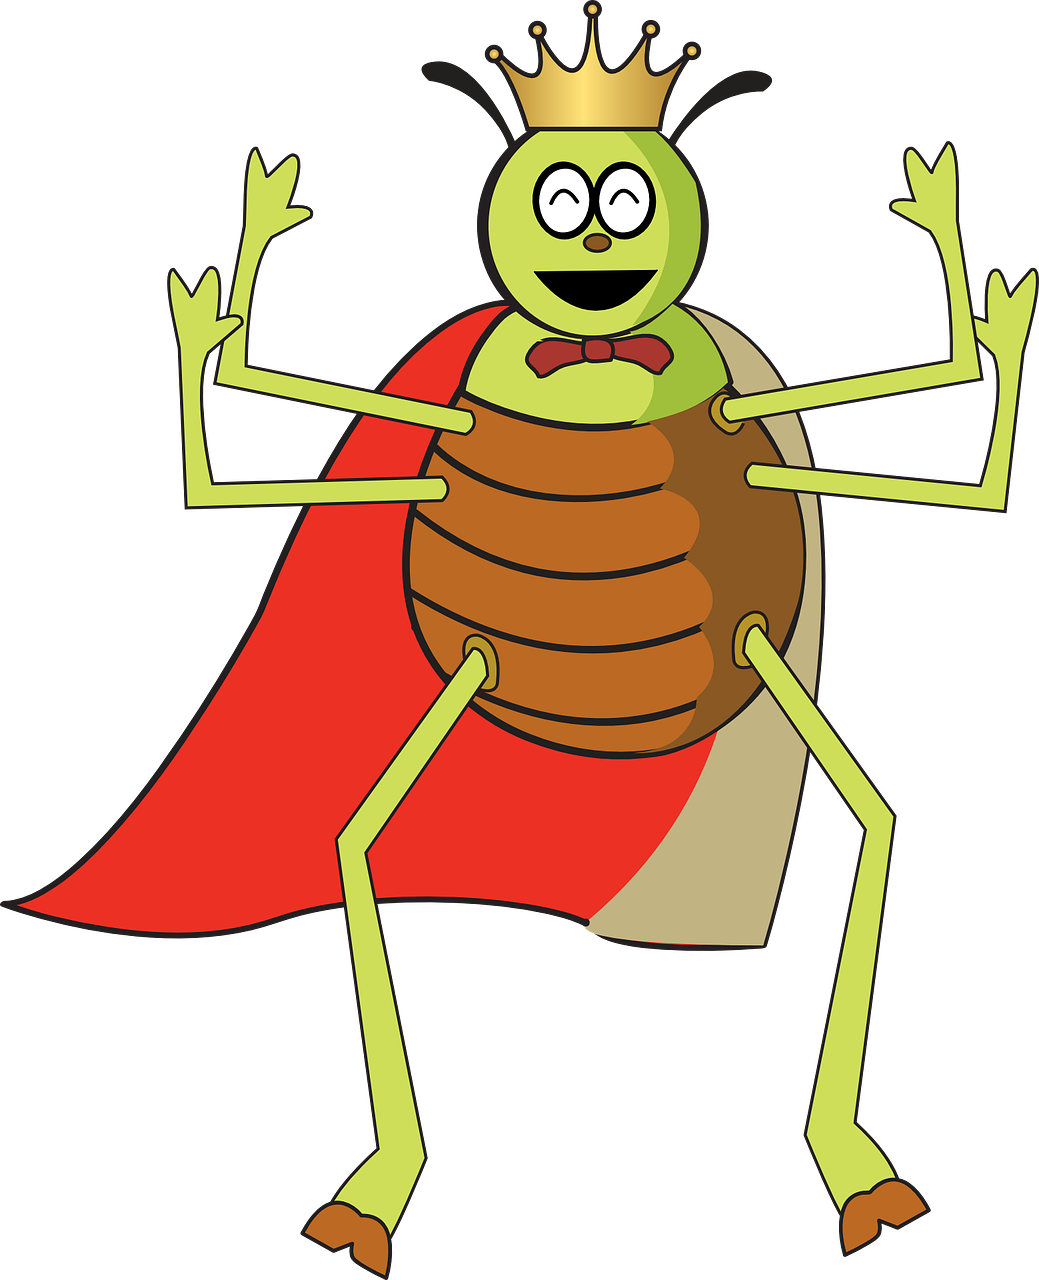 flea-435249_1280.png